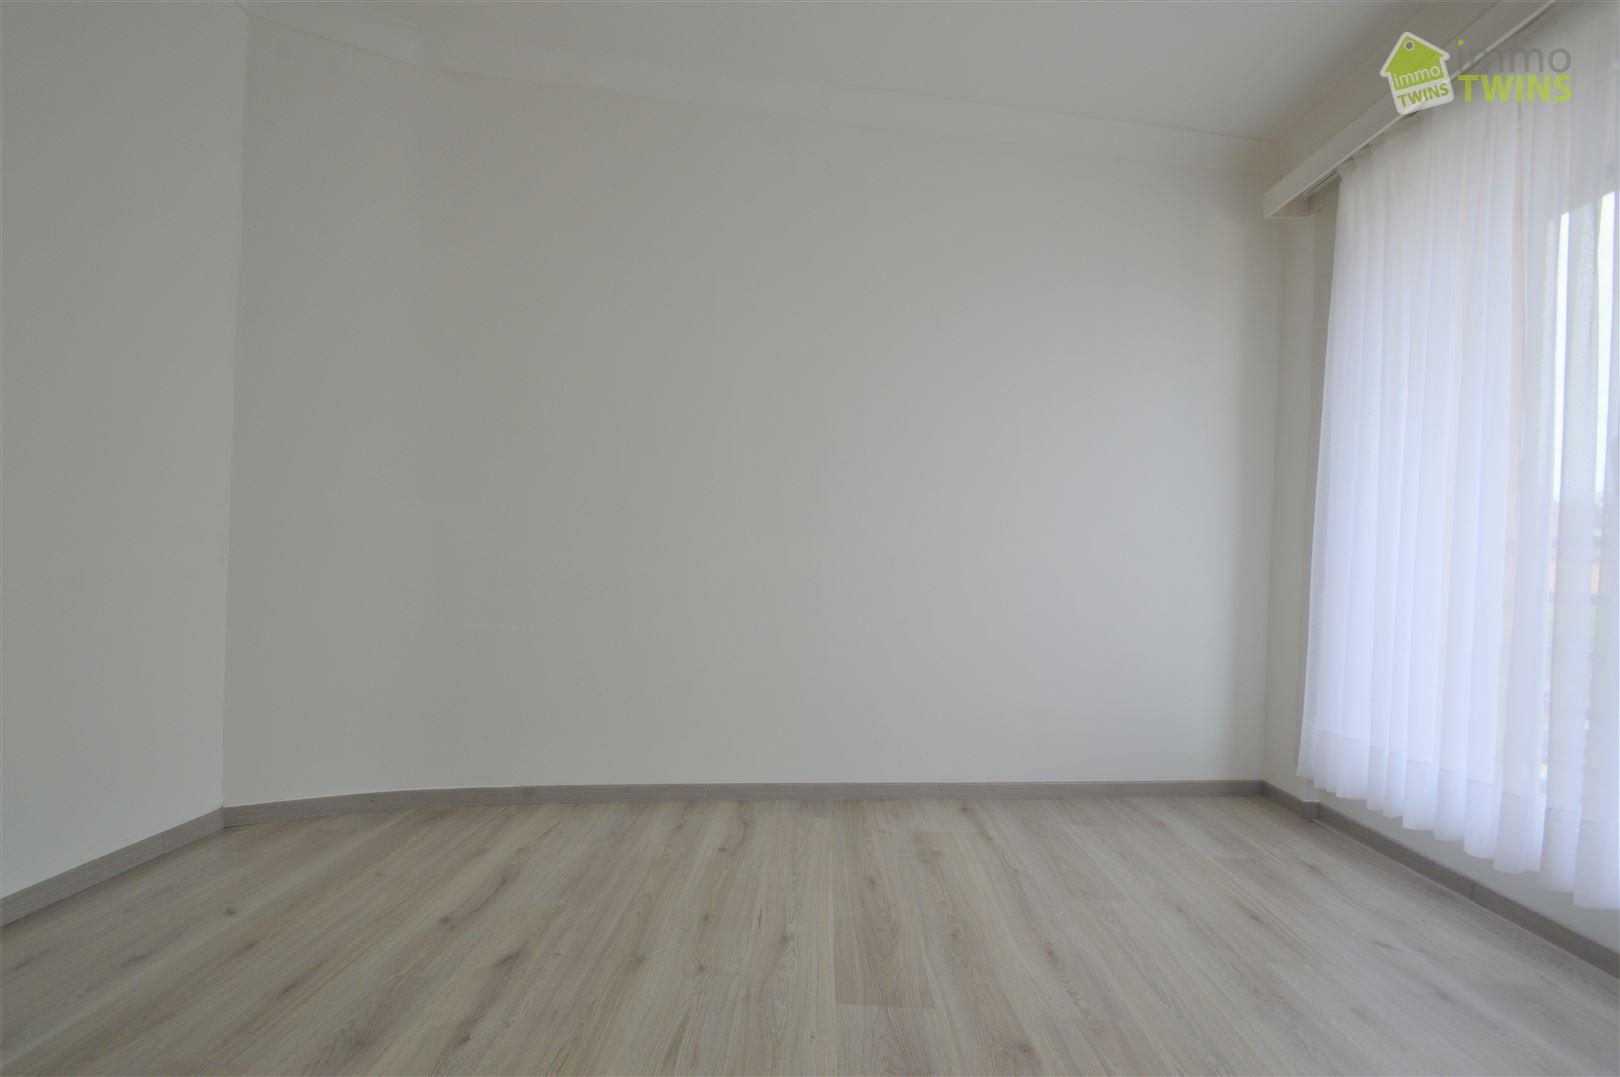 Foto 11 : Appartement te 9280 LEBBEKE (België) - Prijs € 625